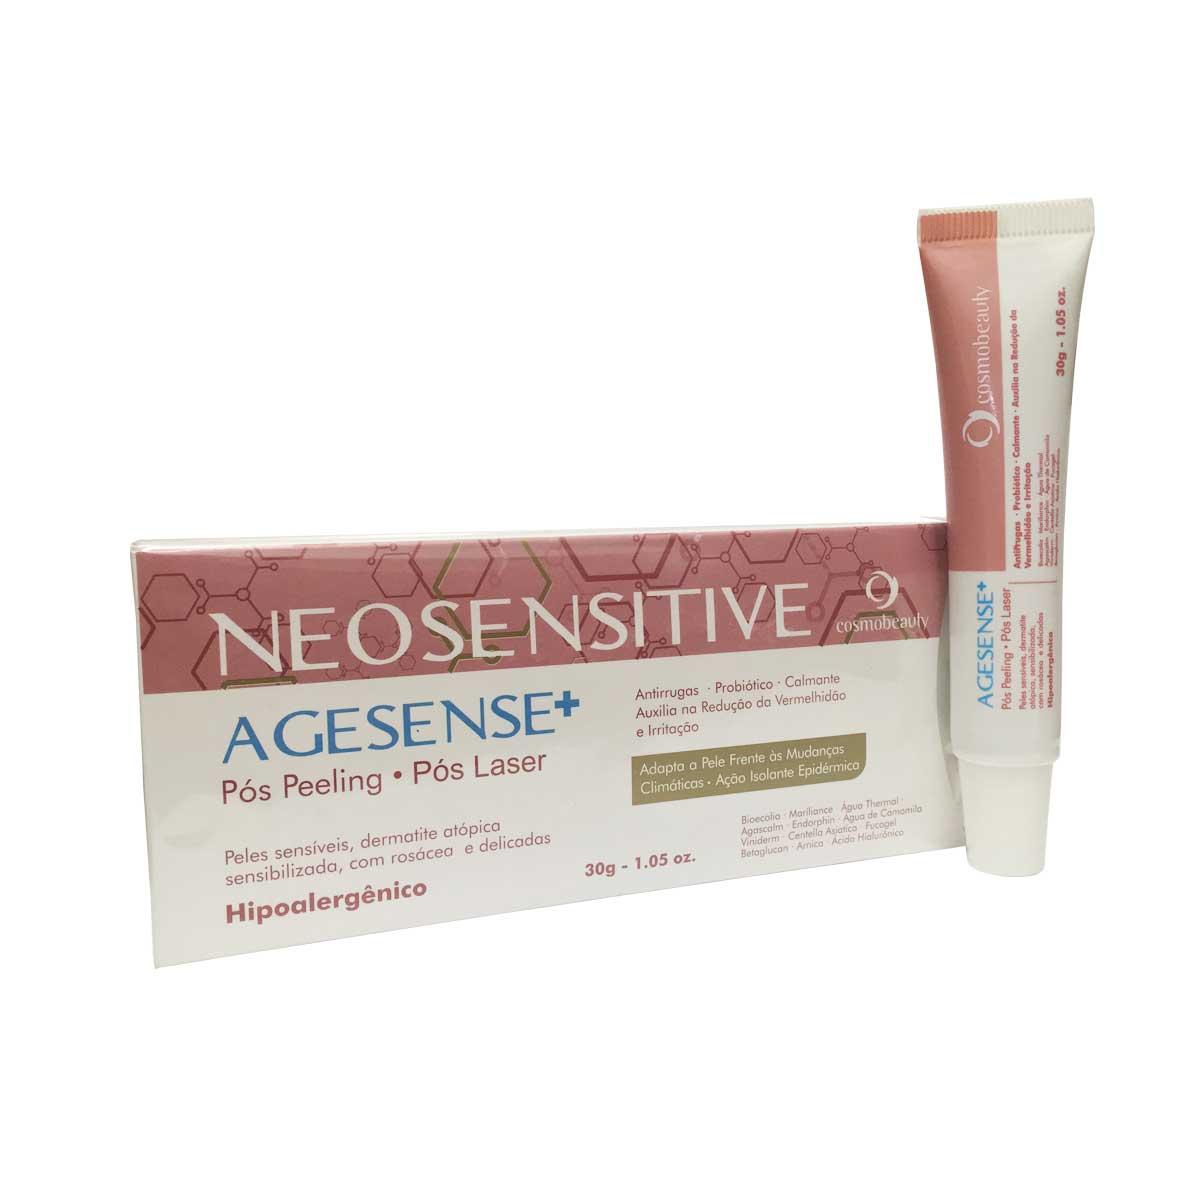 Neosensitve Agesense + - 30g